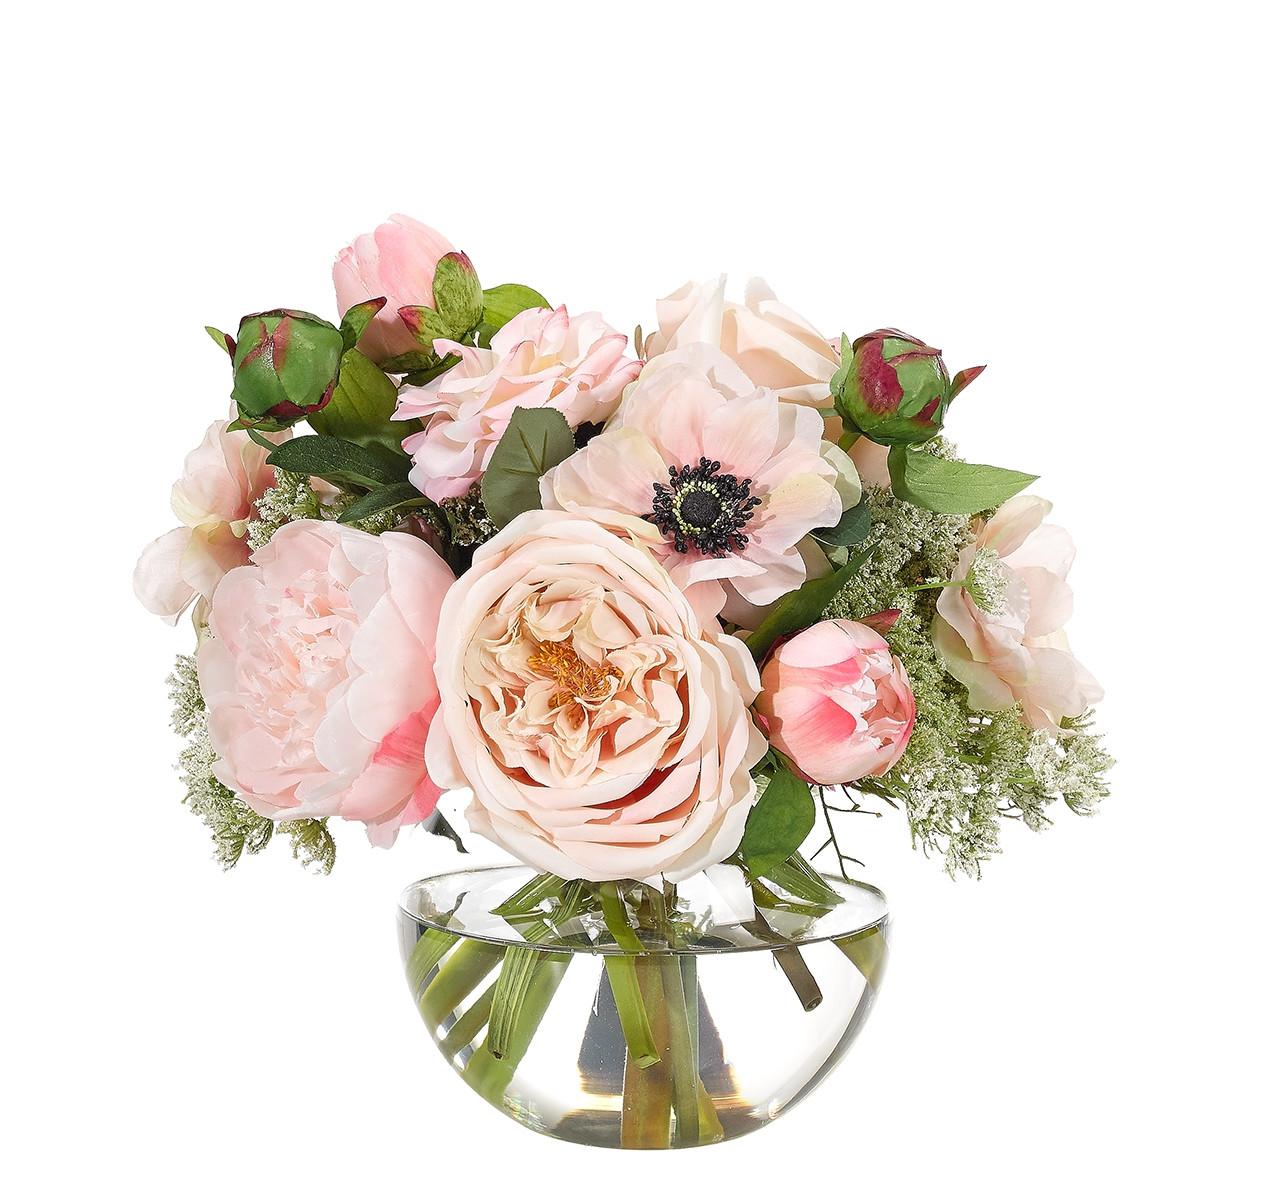 21 Unique Custom Photo Flower Vase 2021 free download custom photo flower vase of ndi faux florals and botanicals inside custom orders